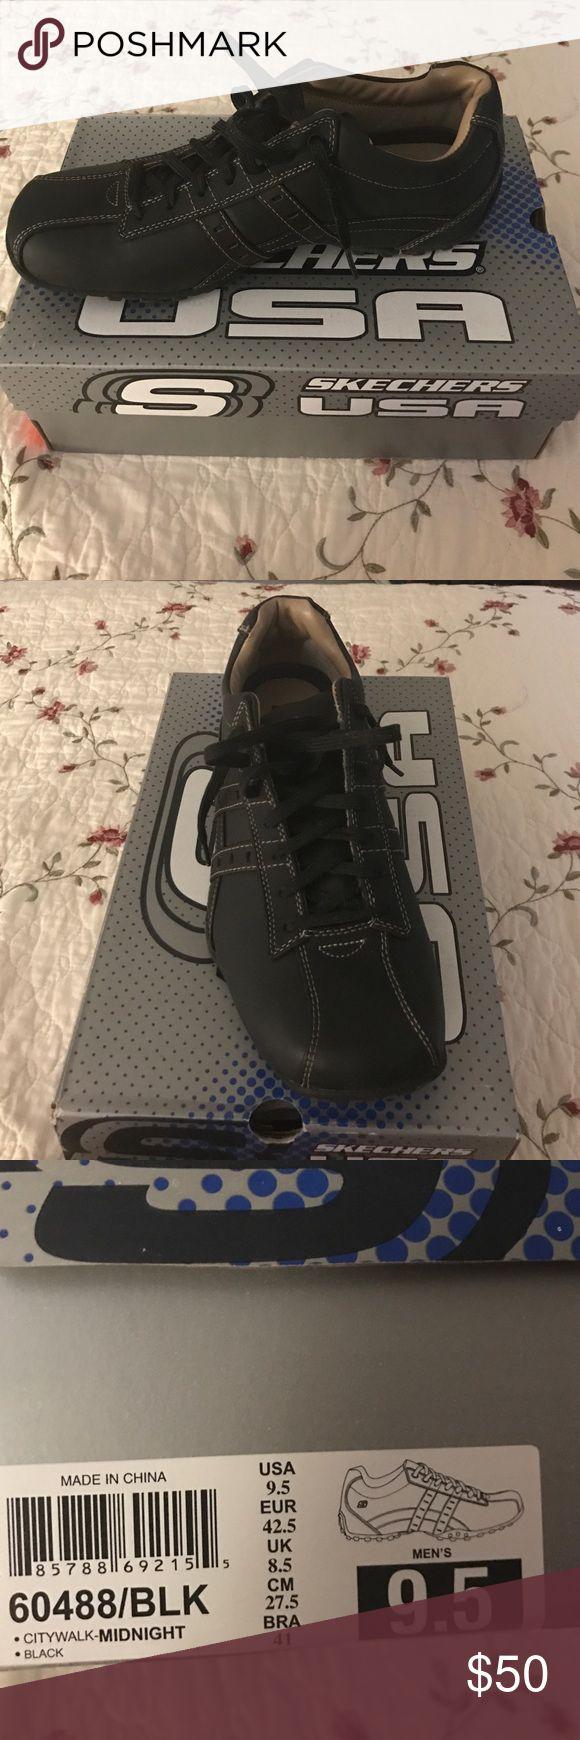 "Skechers ""Citywalk"" All black Skechers shoes. Never worn still in original box. Skechers Shoes Sneakers"